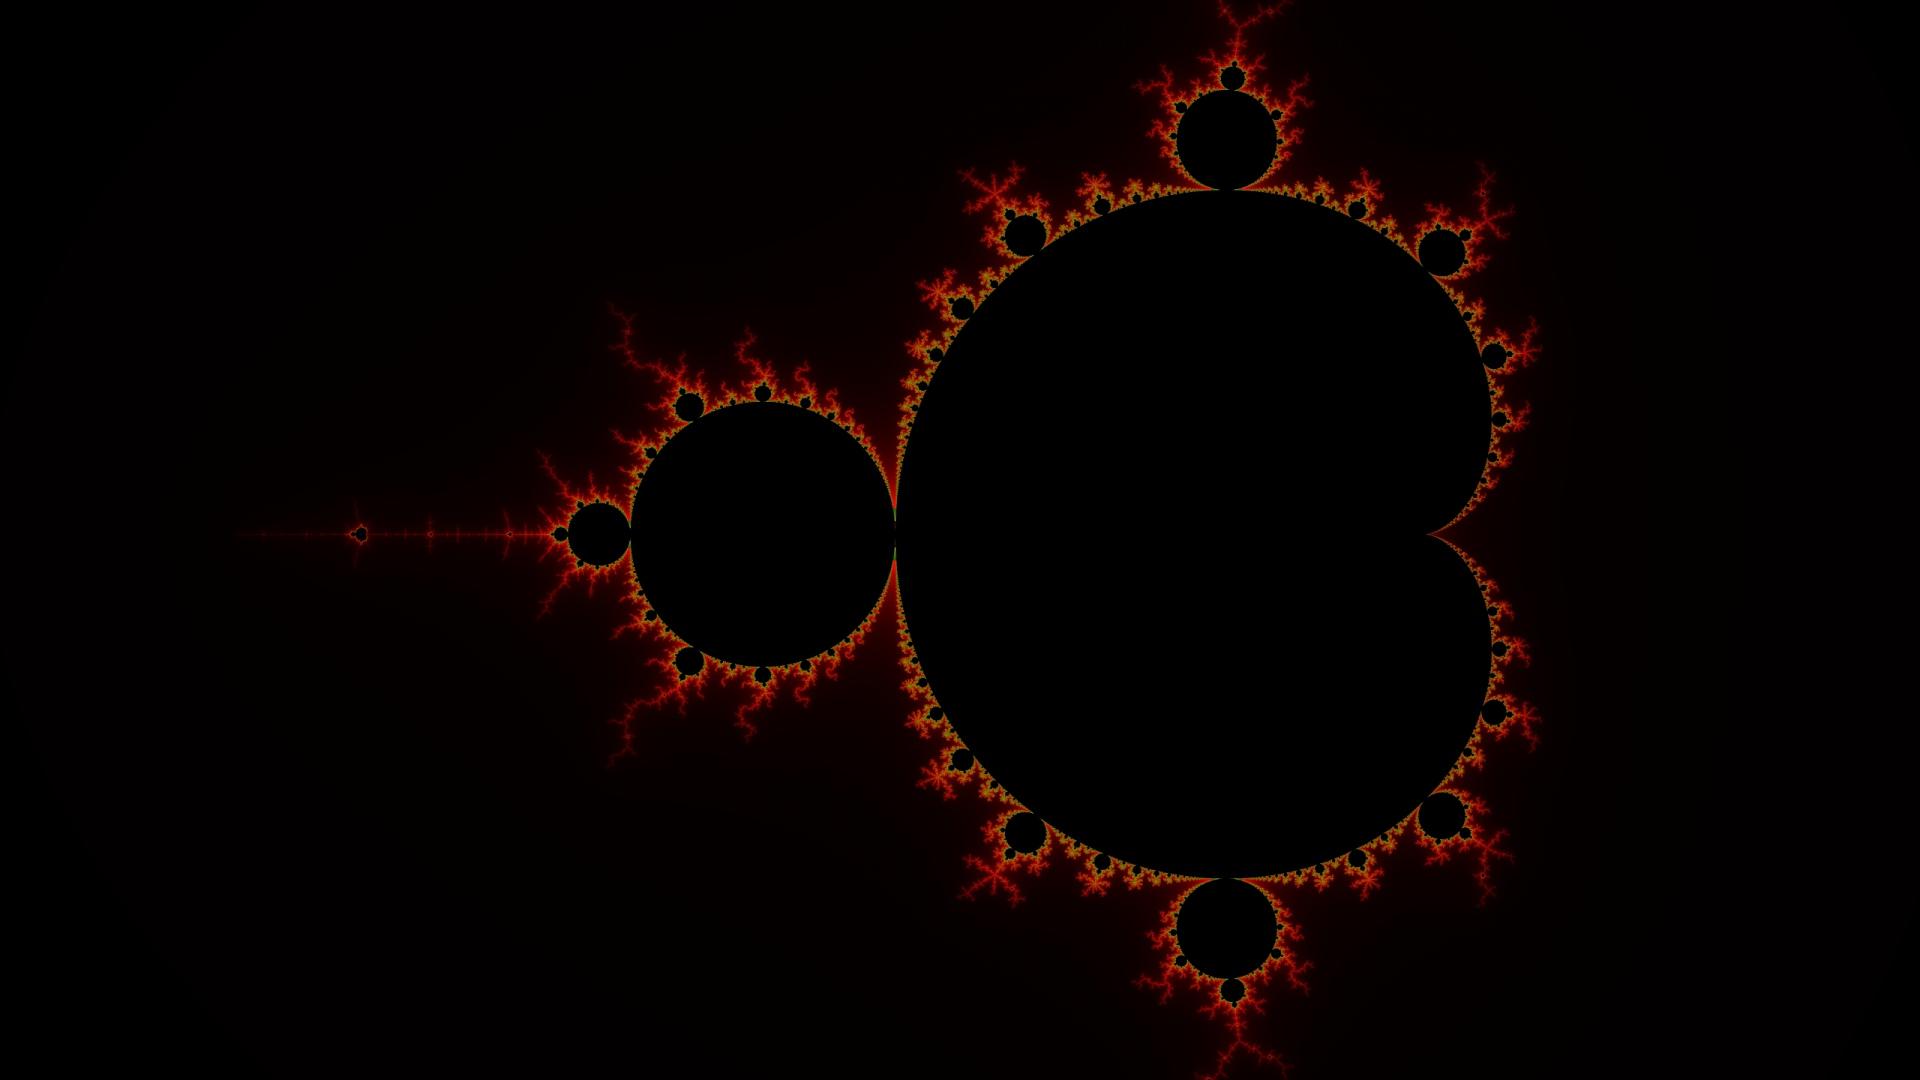 circles, background, crack